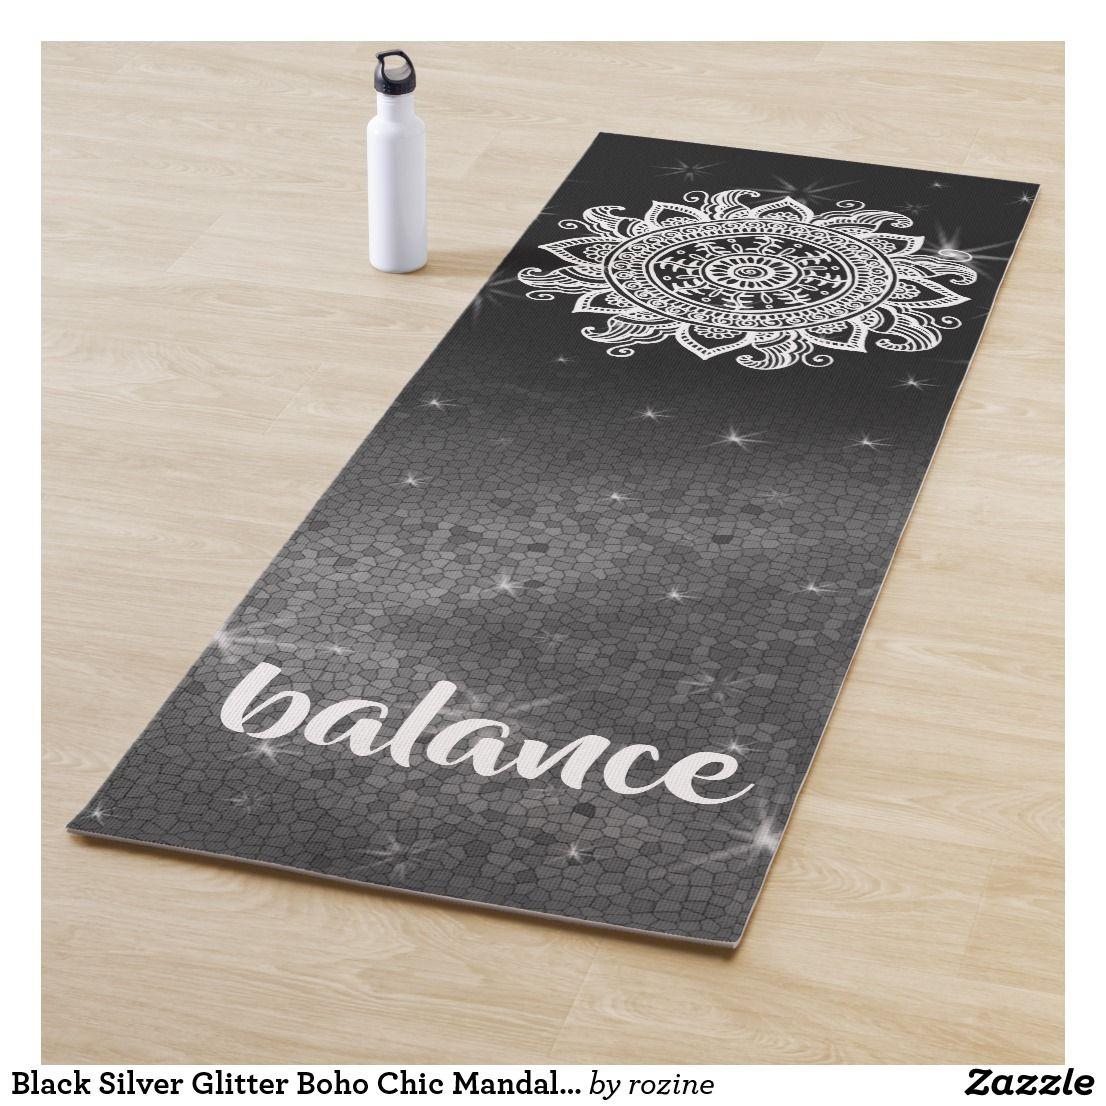 d033479a8d Black Silver Glitter Boho Chic Mandala Zen Balance Yoga Mat